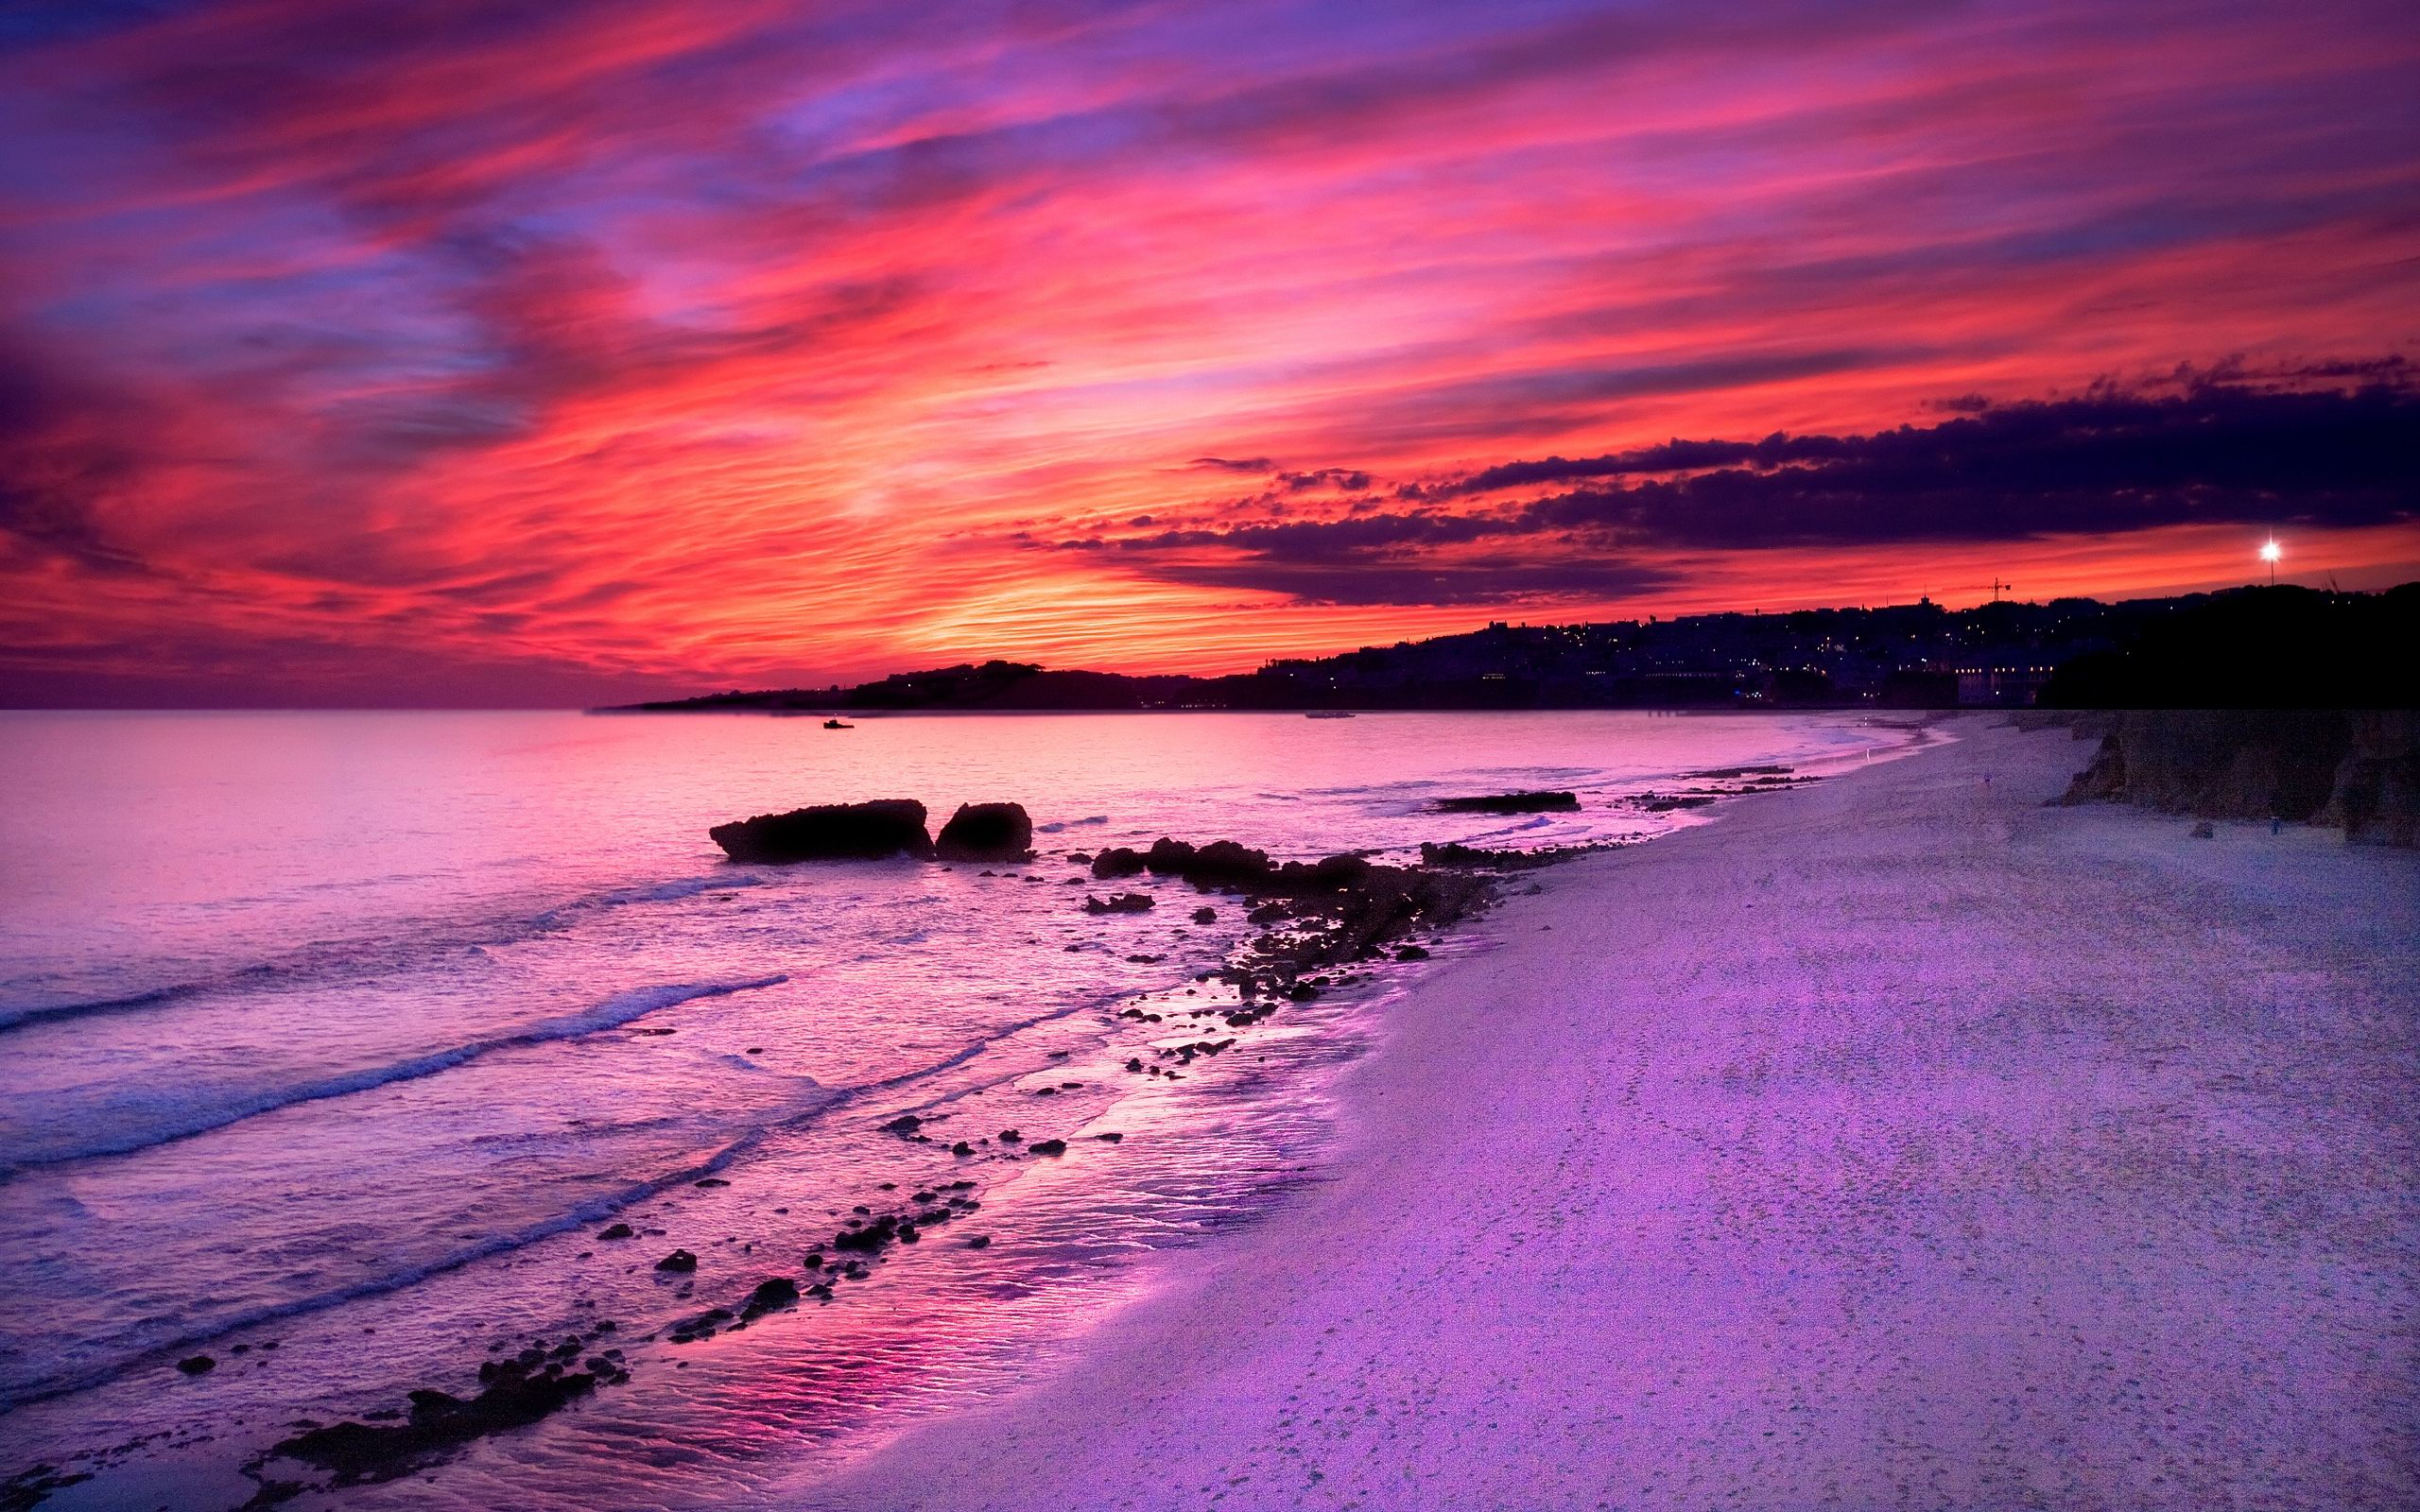 Colorful Beach Sunset at Flakstad beach.